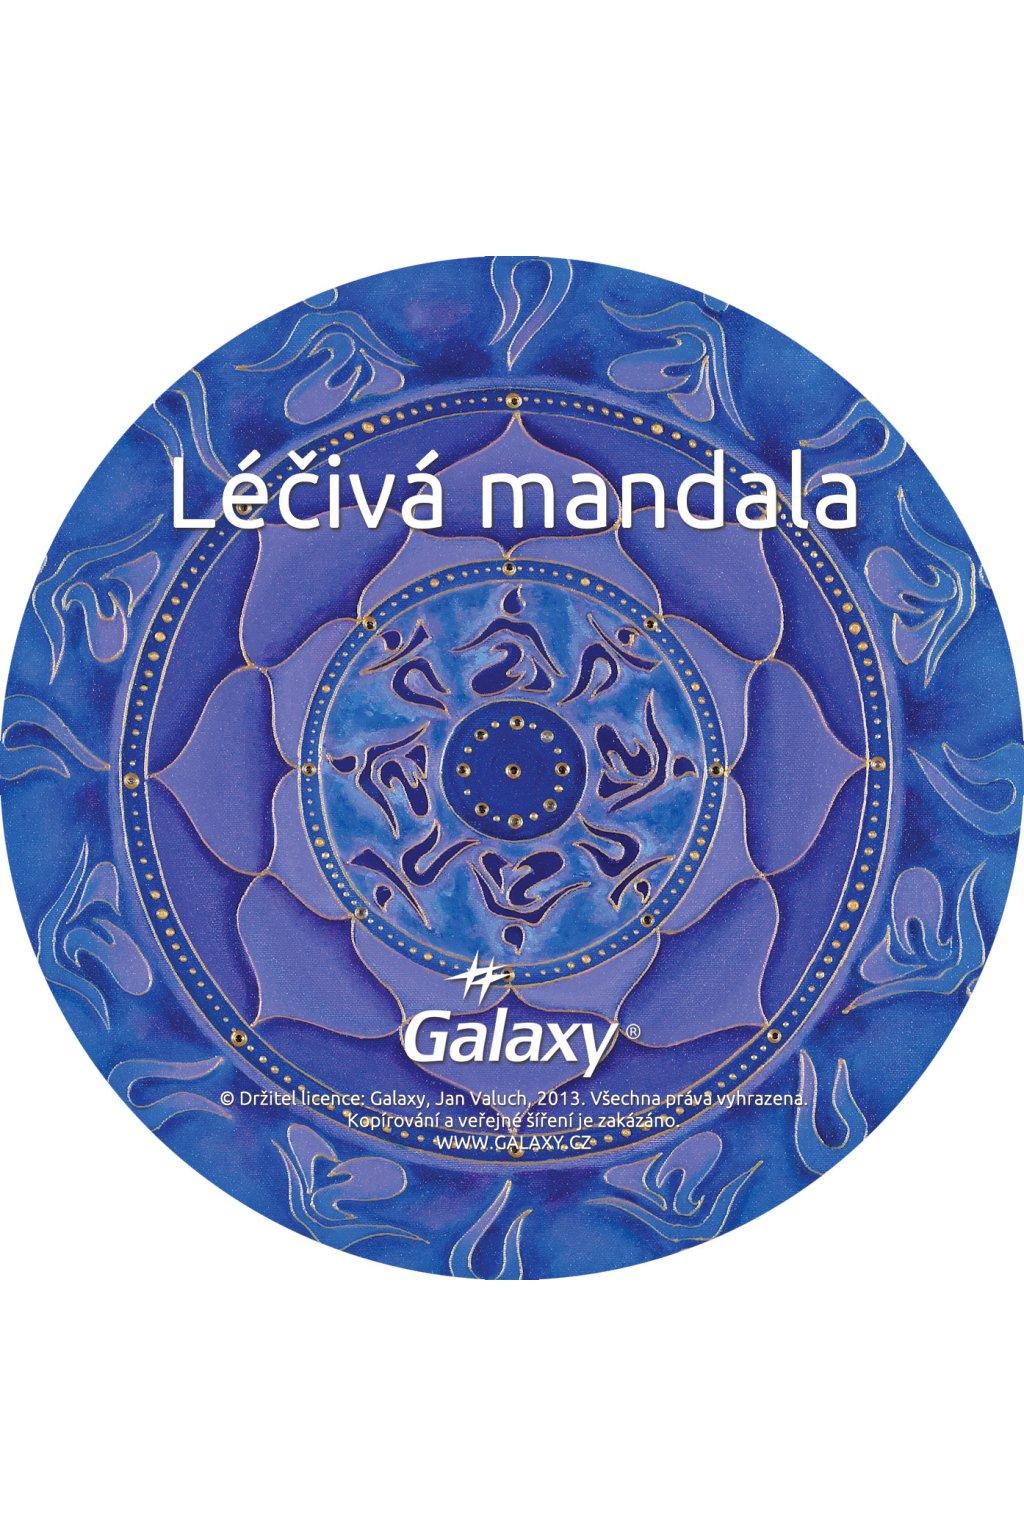 leciva mandala disk